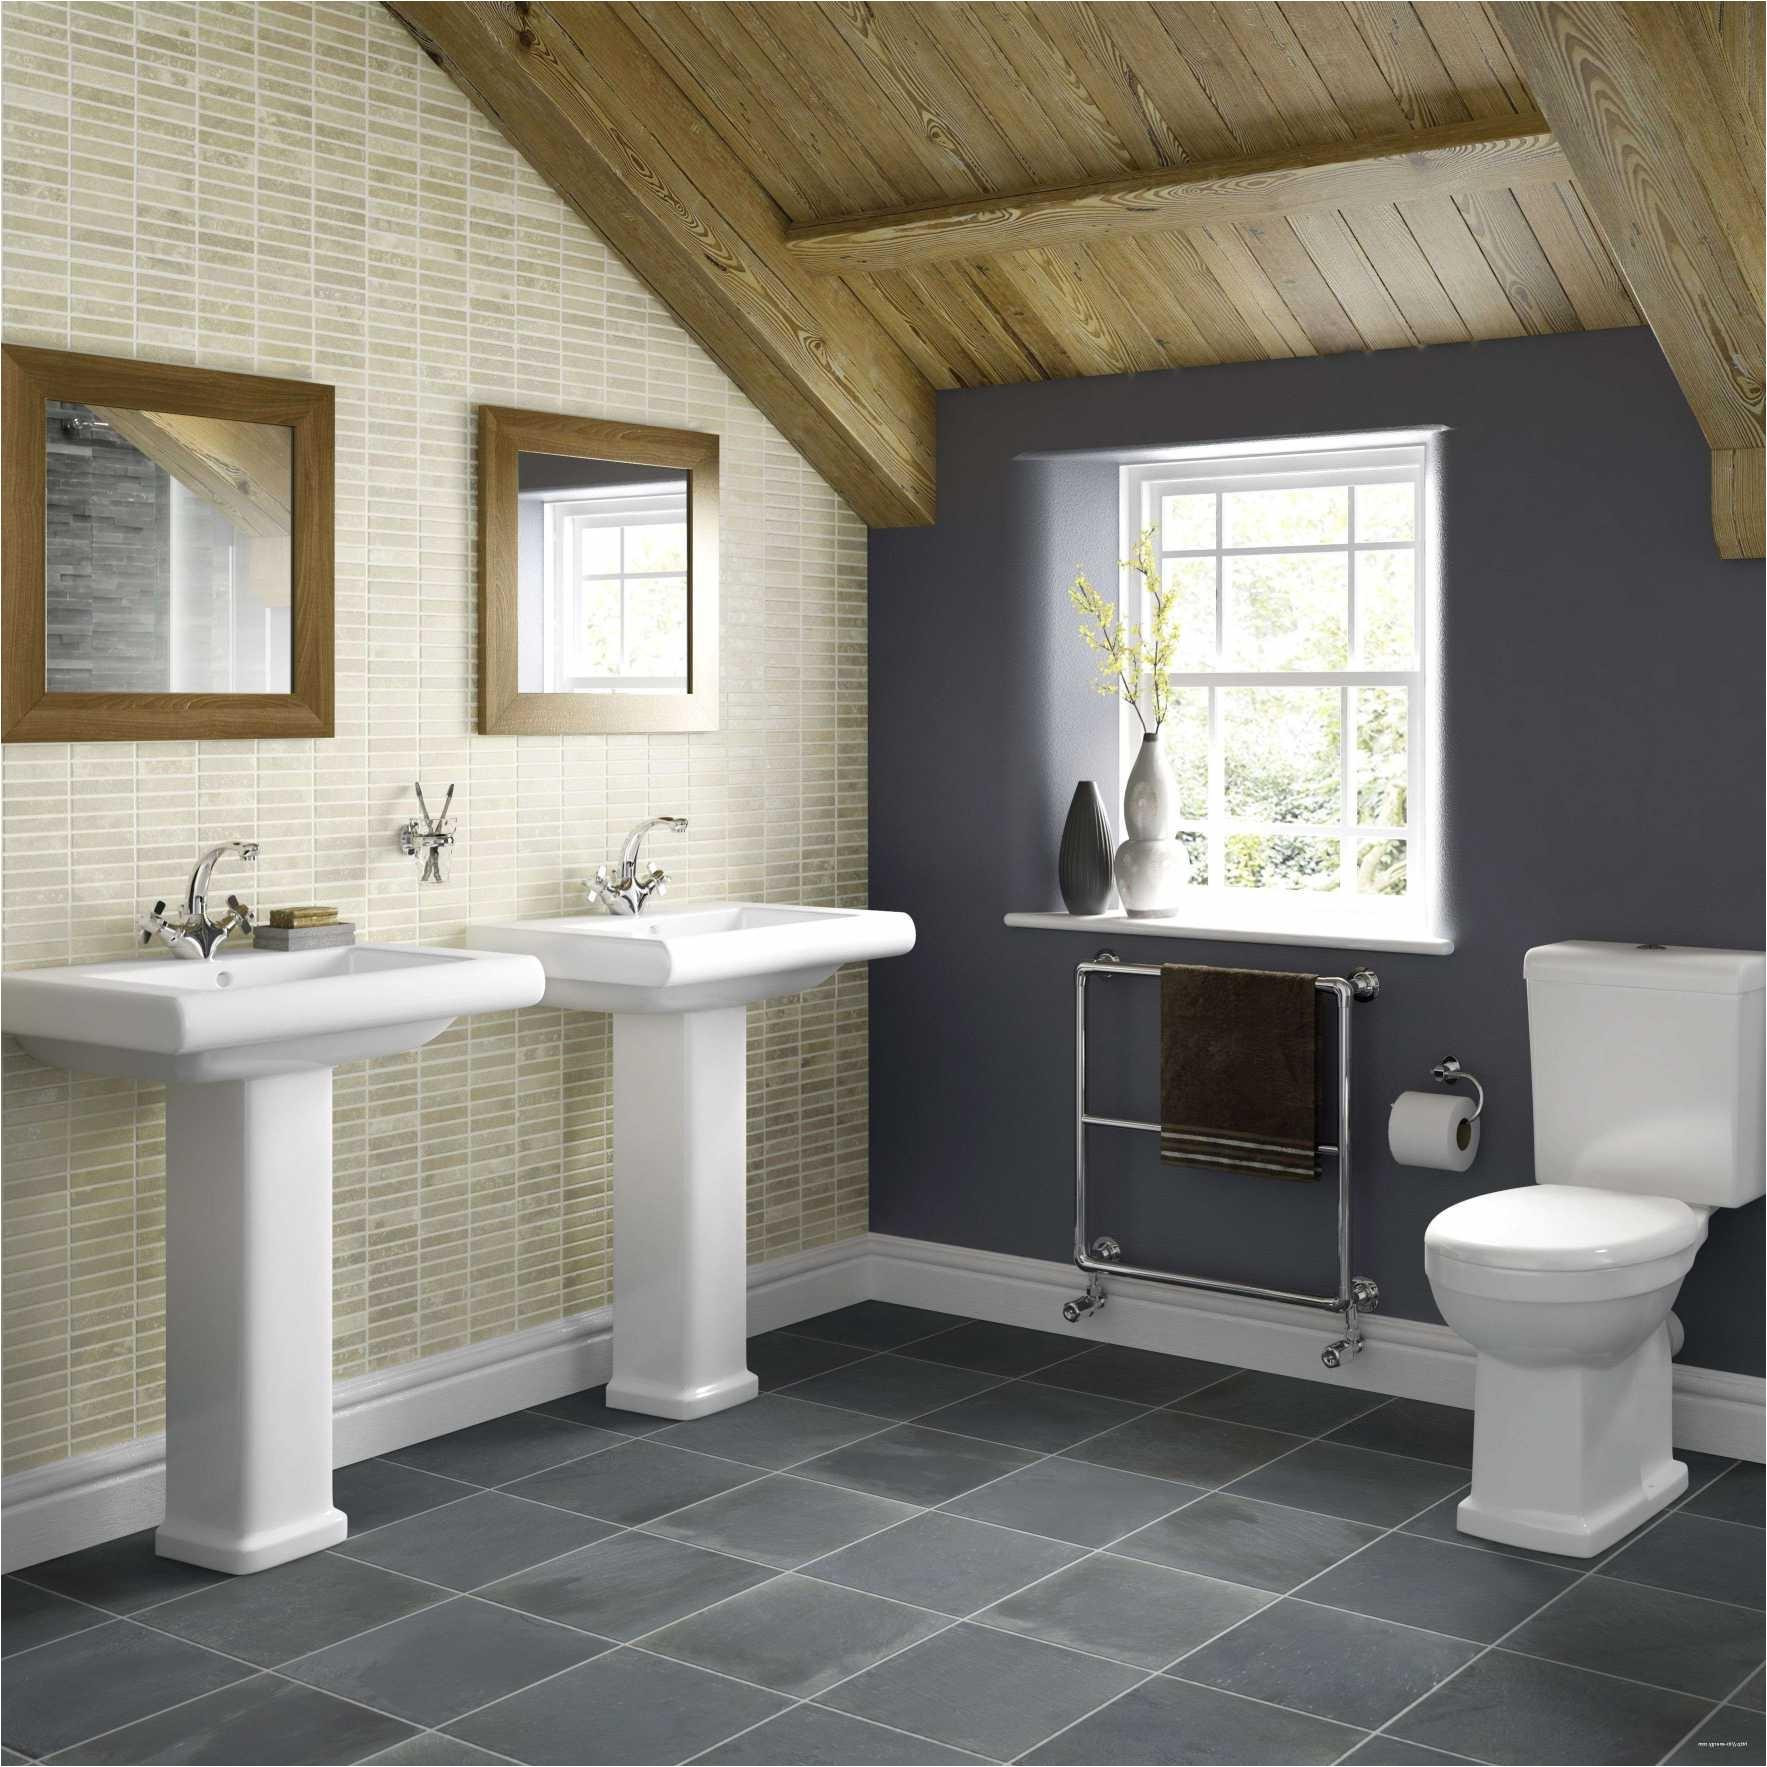 Cheap Bathtubs for Sale Get Porcelanosa Bathtub Prices Bathtubs Information